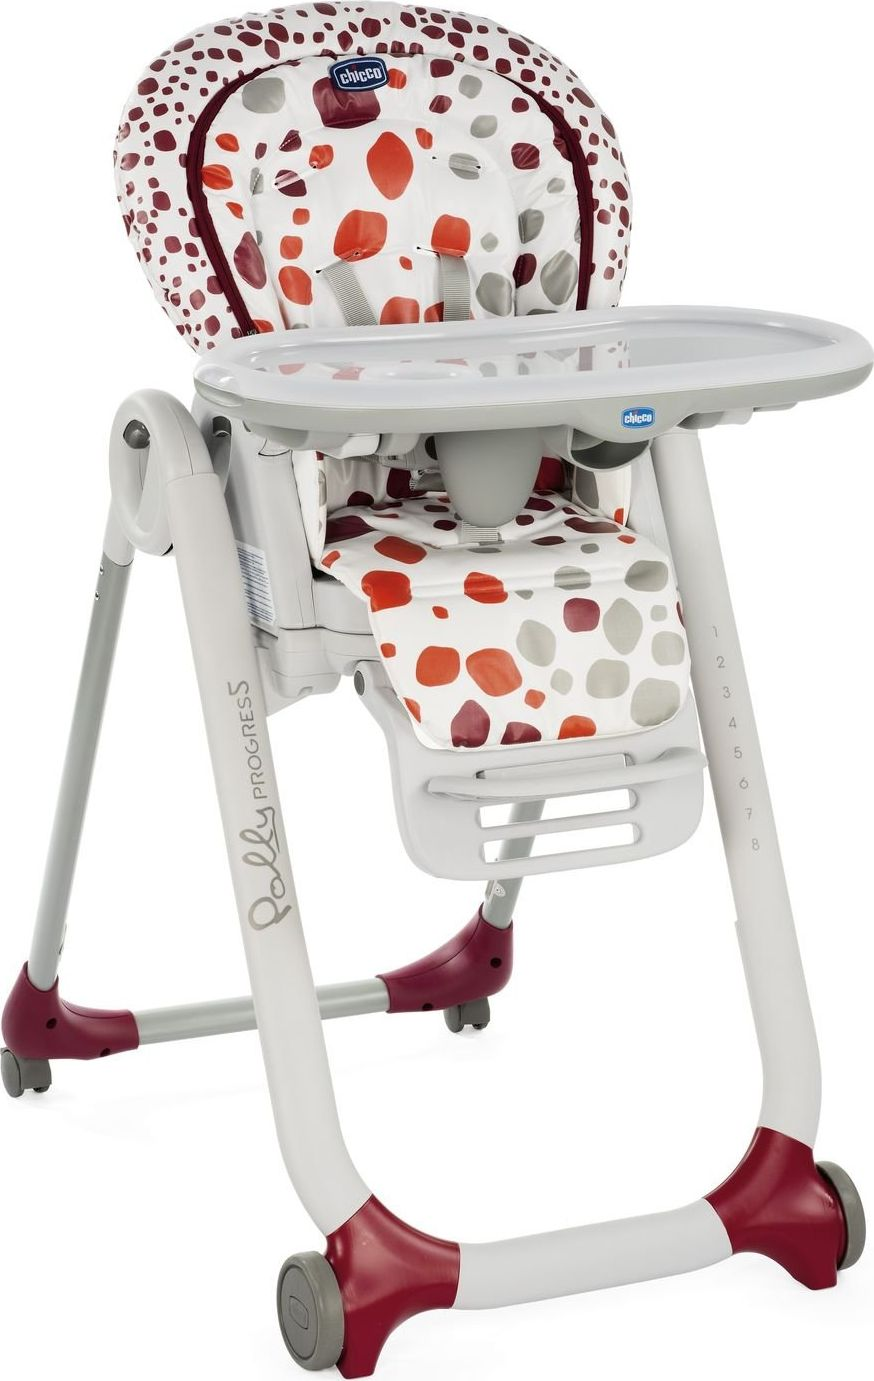 Chicco Krzeselko Polly Progres5 4 Kolka Cherry GXP-685390 bērnu barošanas krēsls